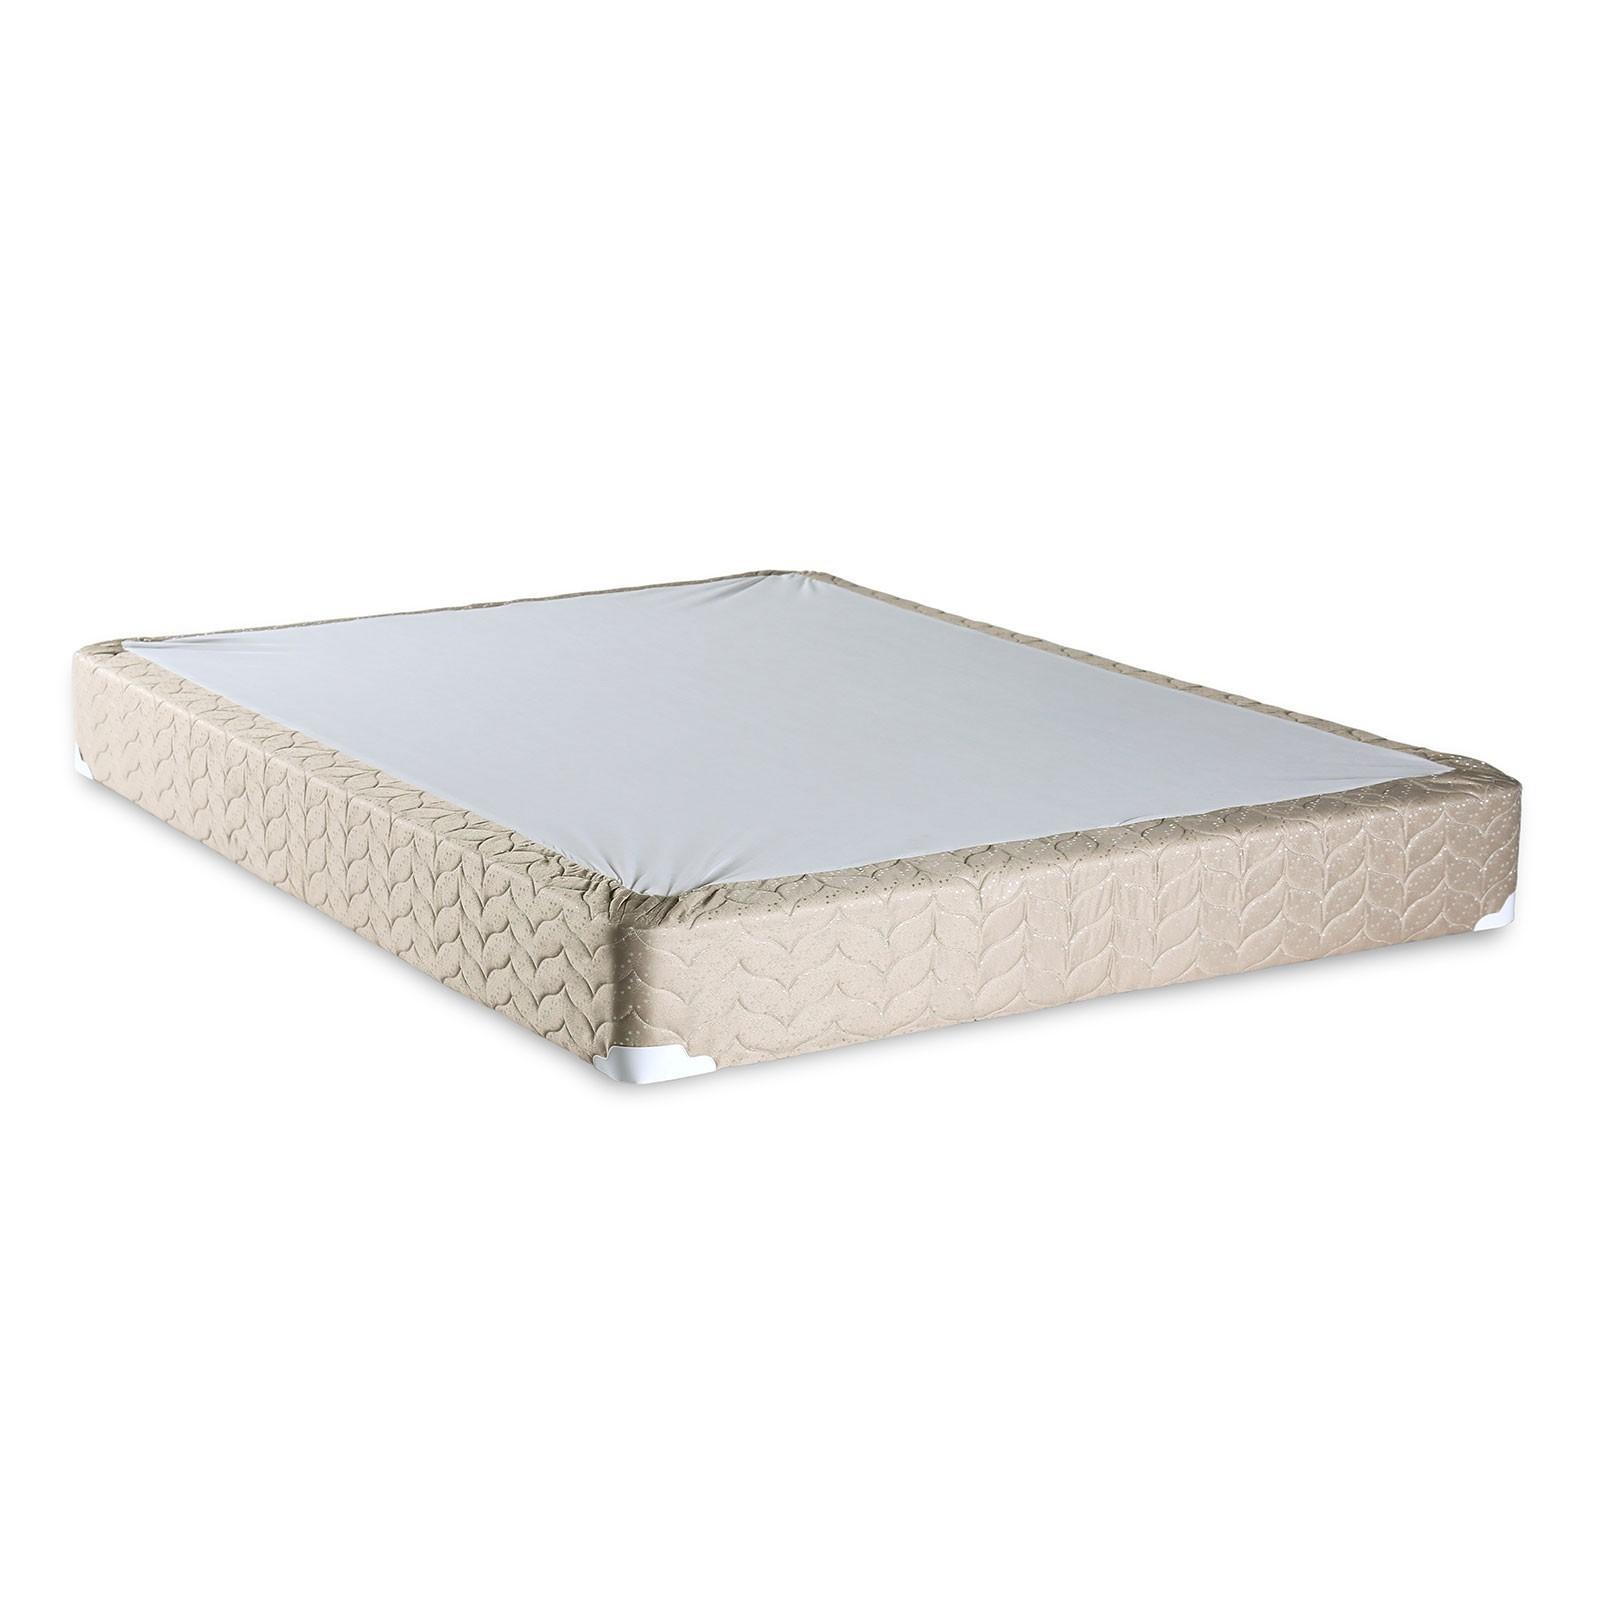 DM-318-F Alcott hill bratton Dreamax lilium bed foundation Made in USA